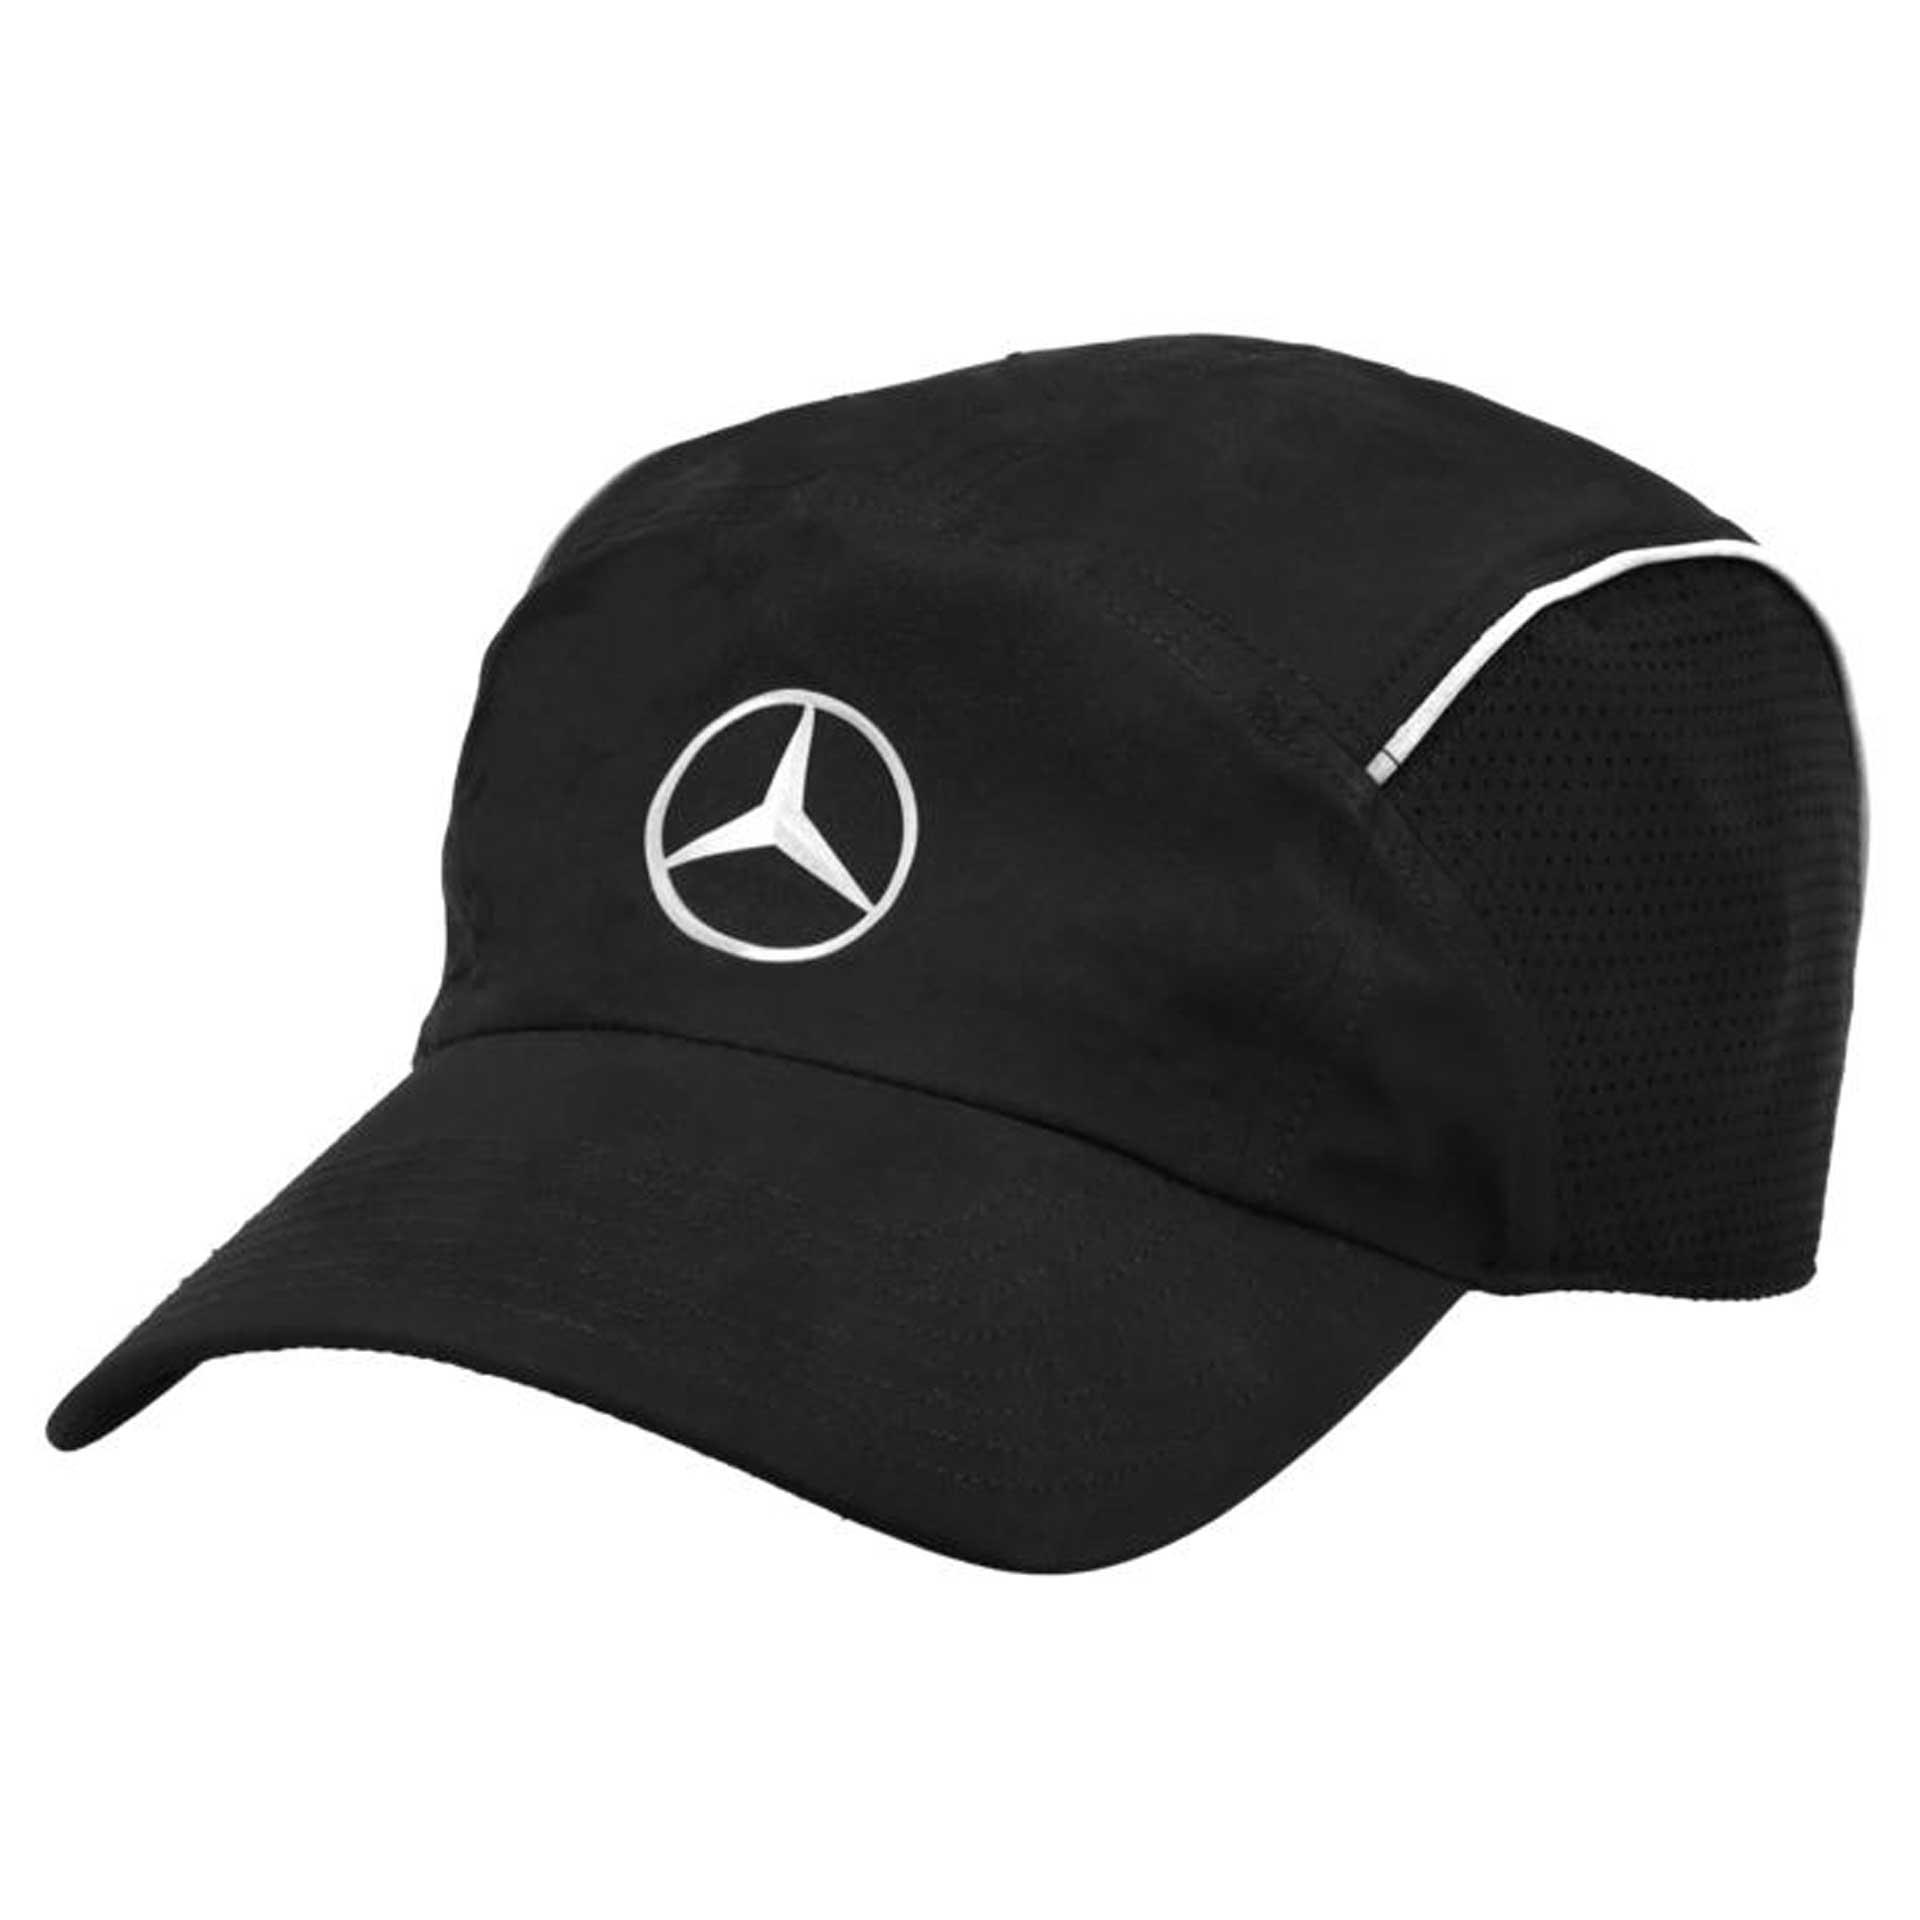 Mercedes-Benz Cap Kappe Basecap Schwarz by PUMA